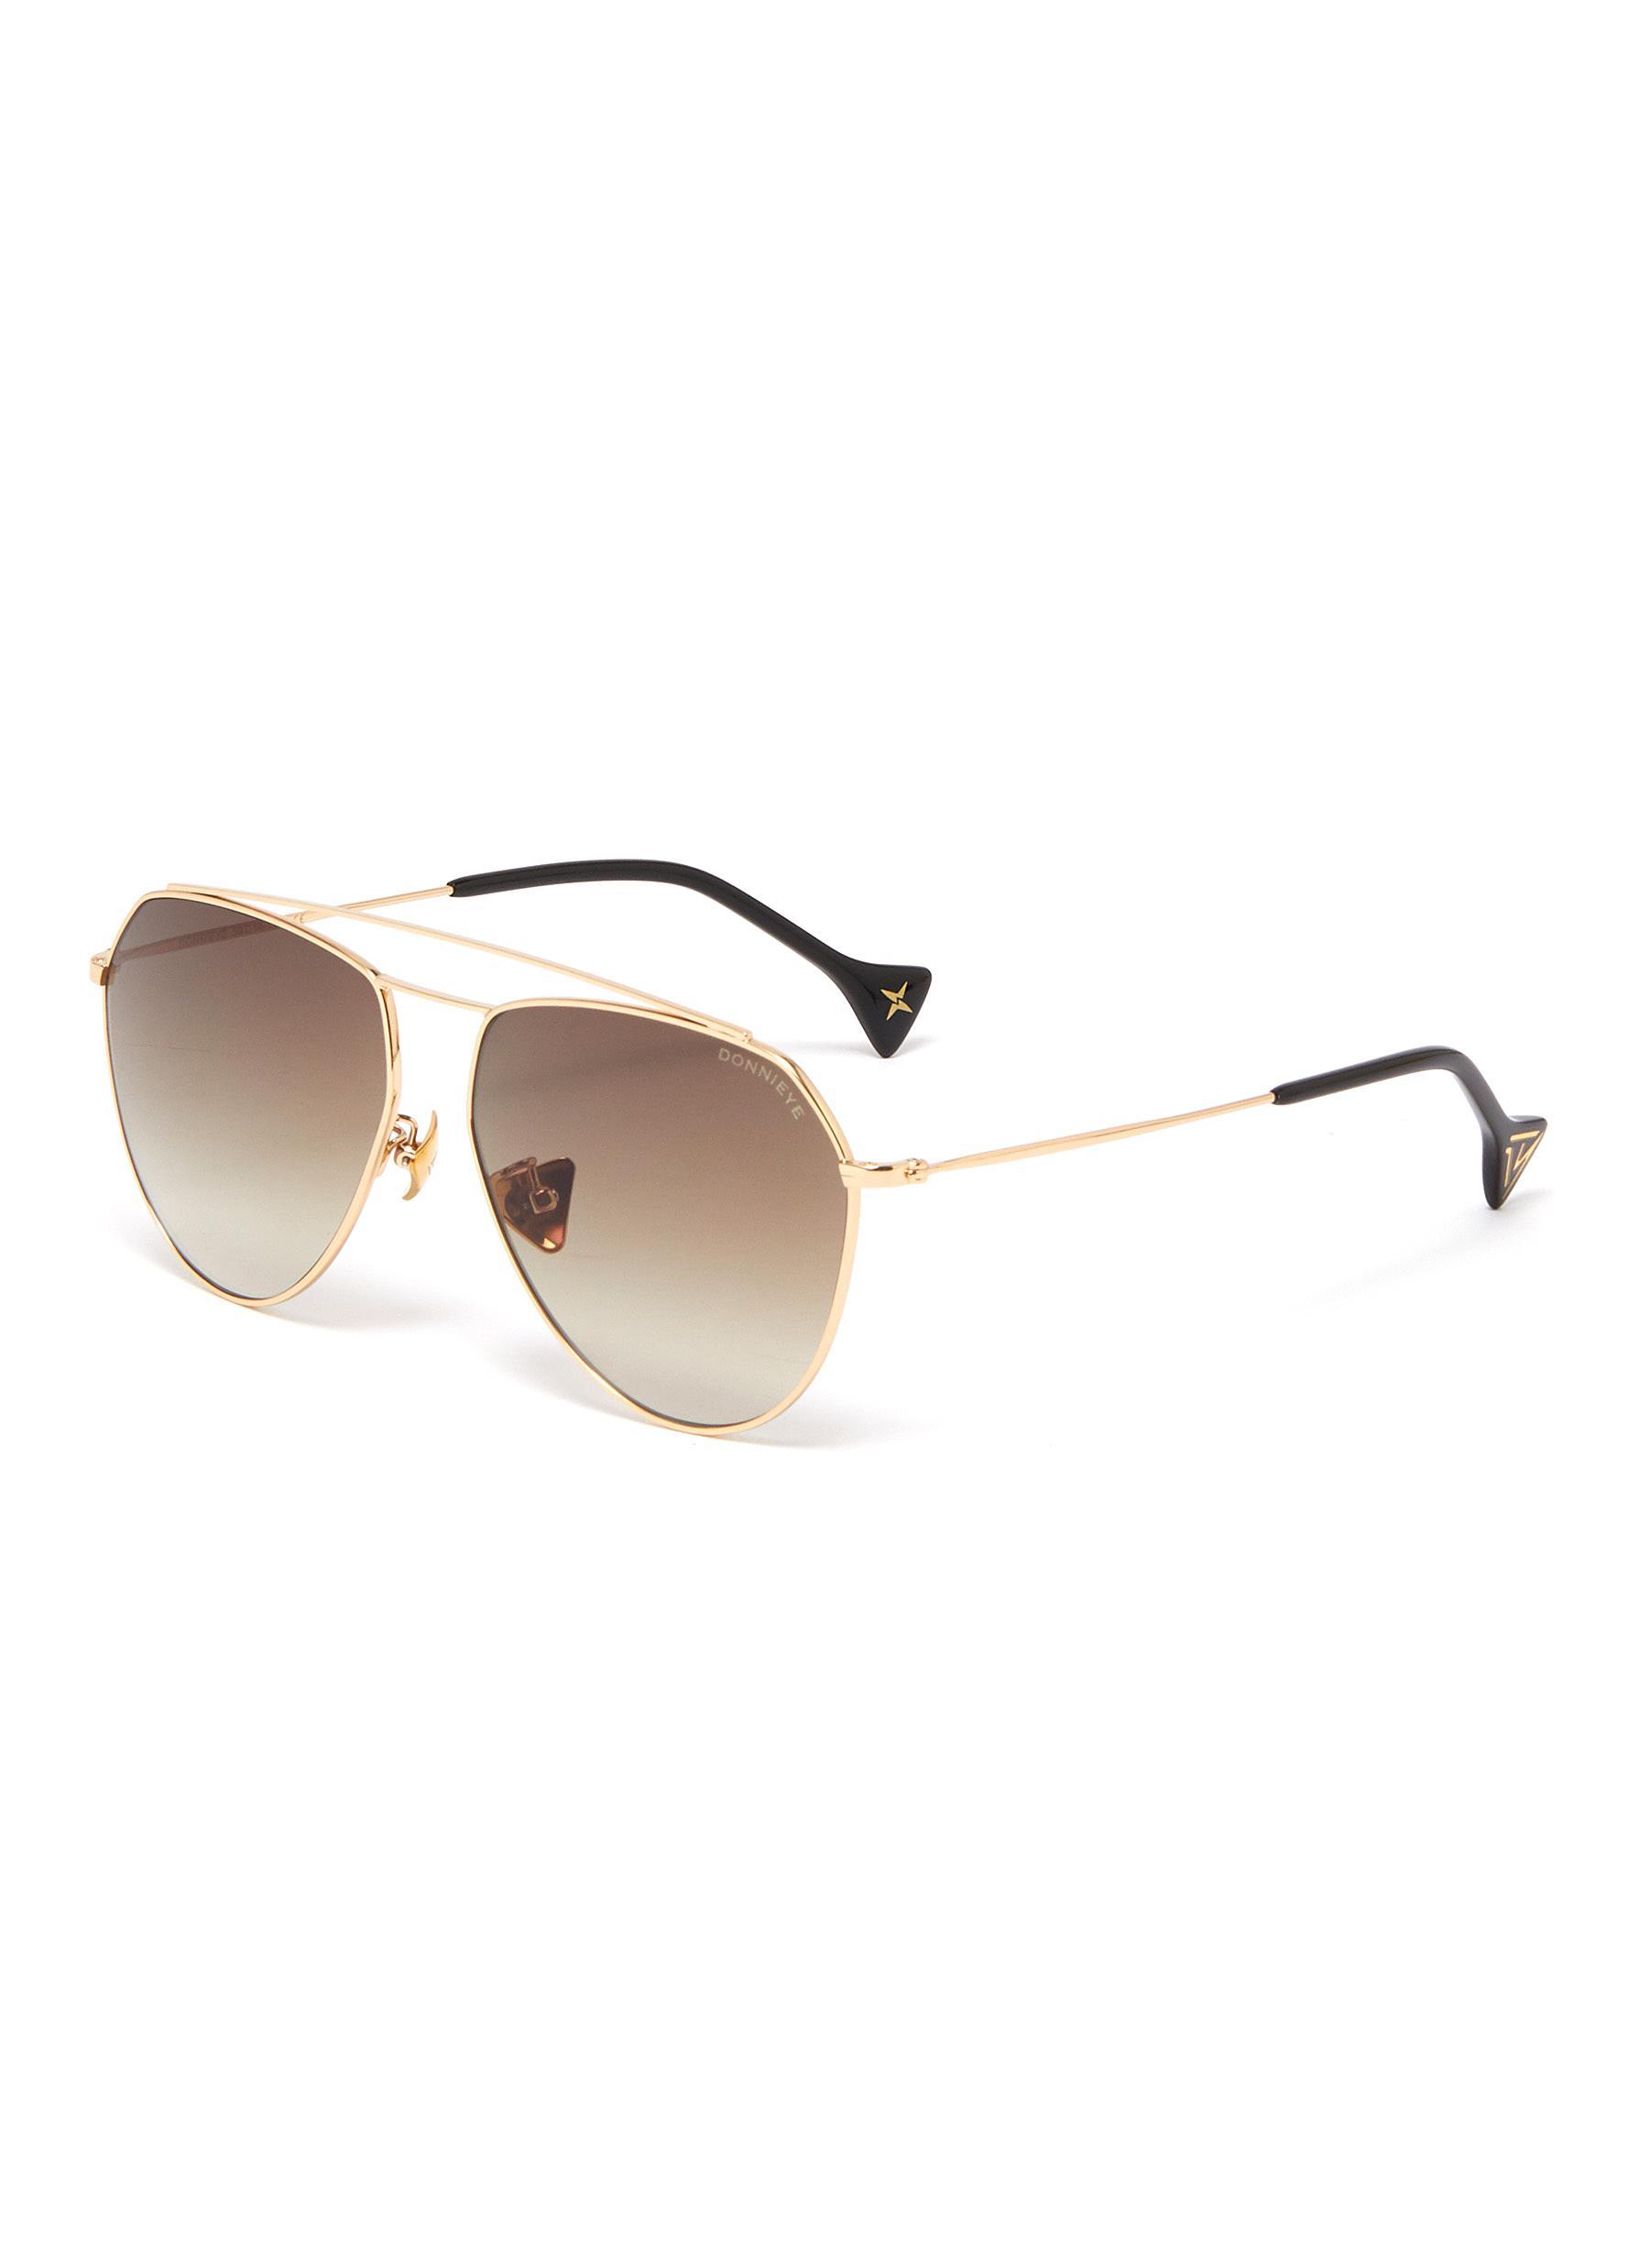 'Divine' metal frame aviator sunglasses